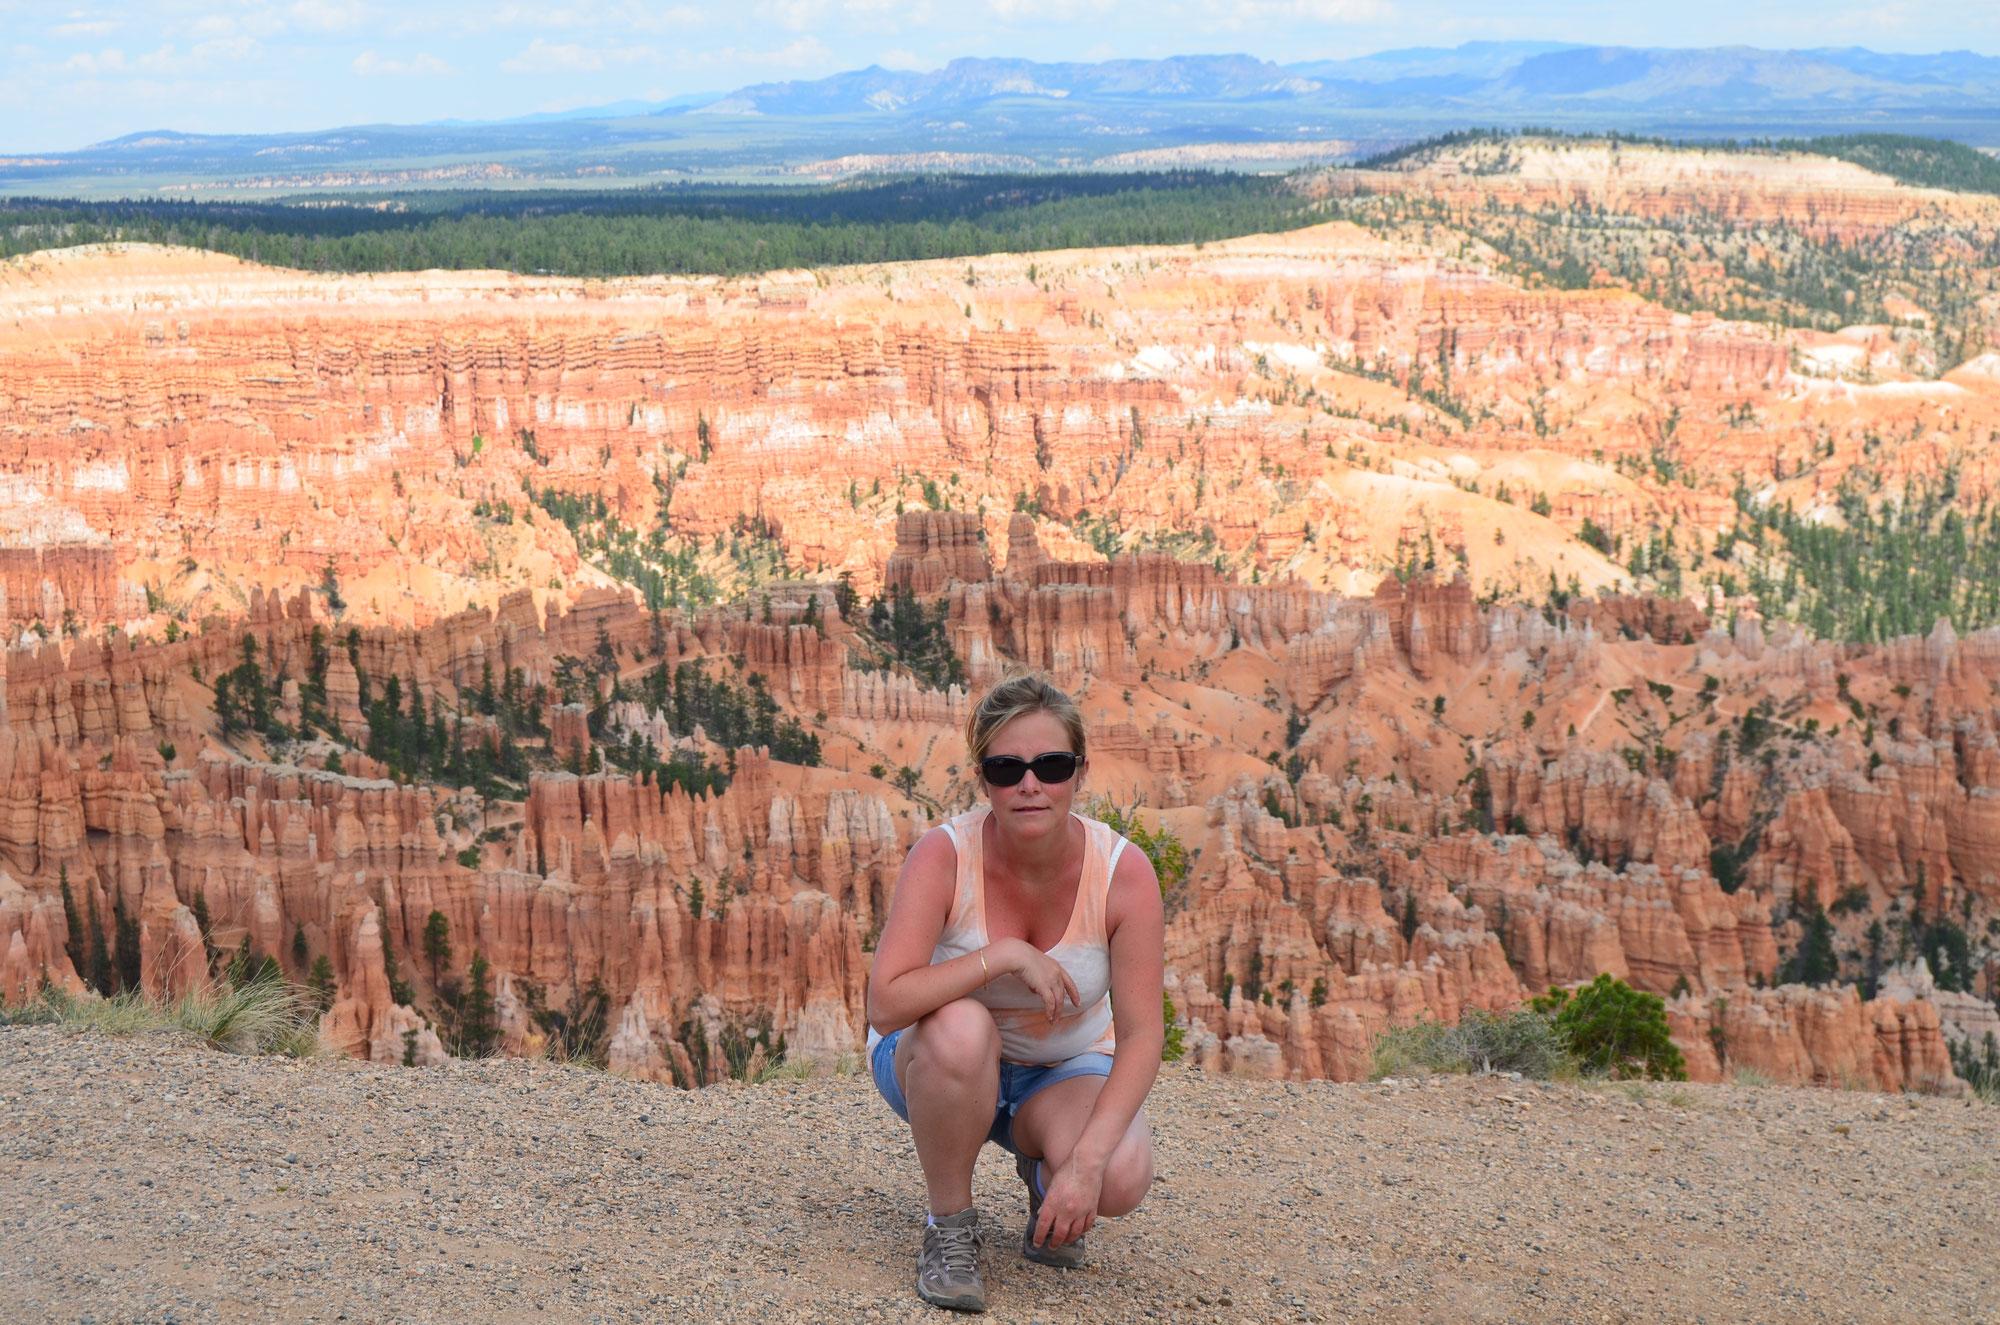 ROAD TRIP USA #1 - Bryce Canyon National Park